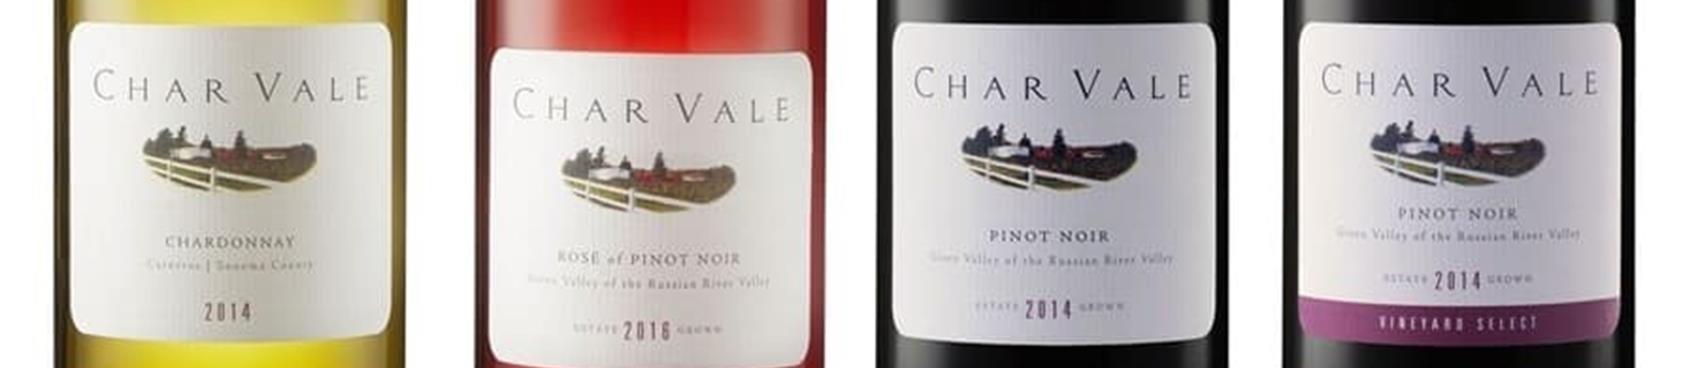 Char Vale Vineyards